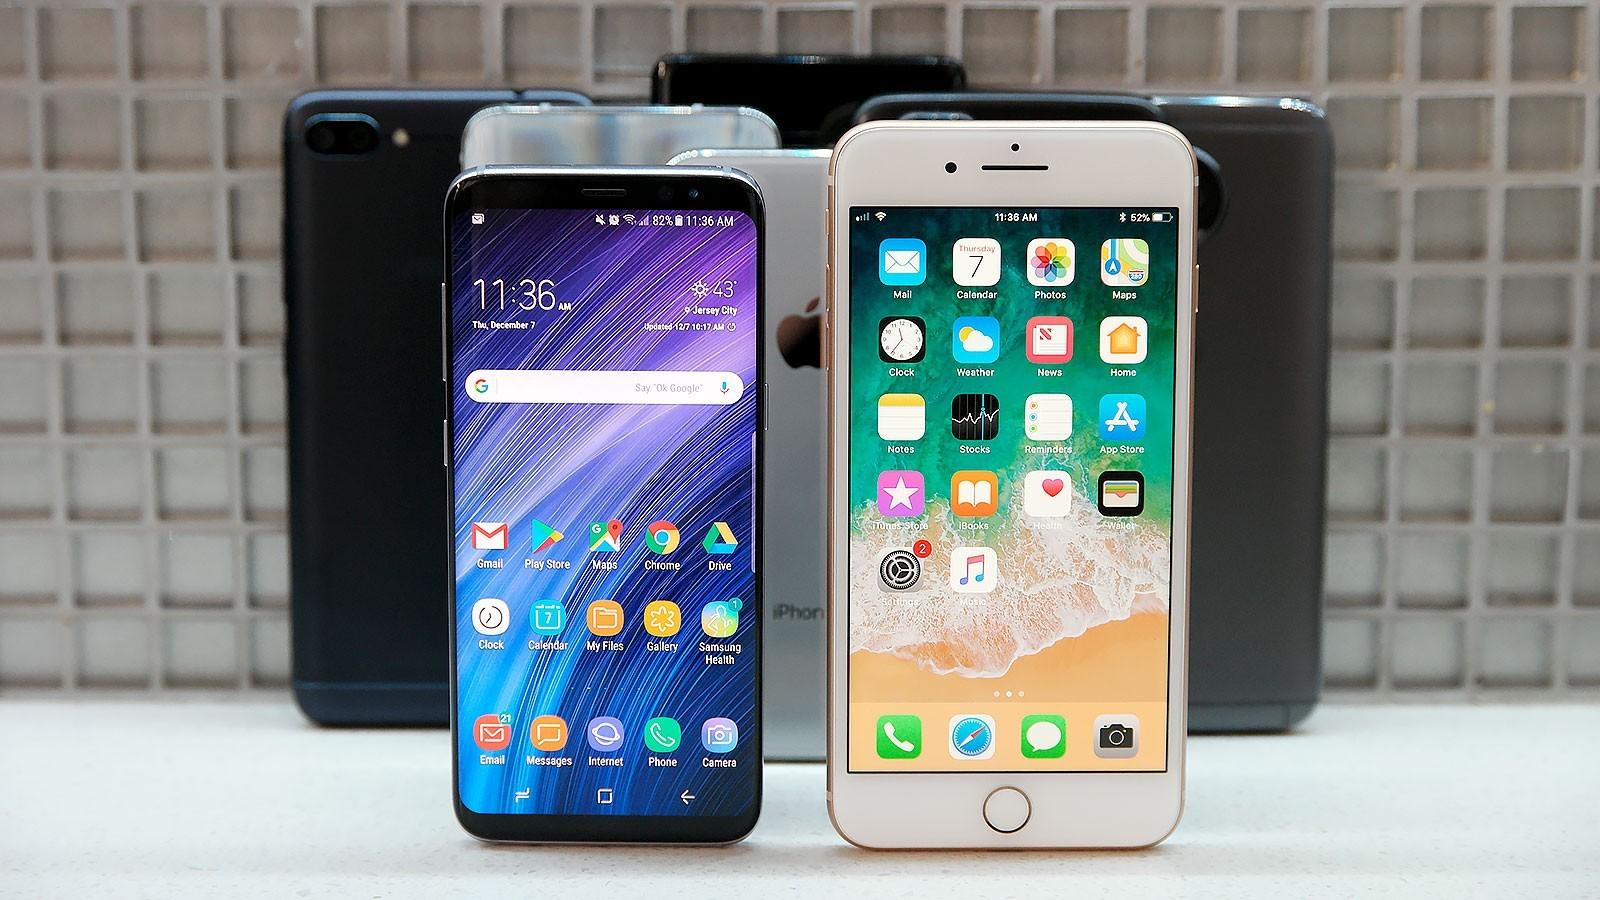 Doanh số smartphone toàn cầu tiếp đà giảm